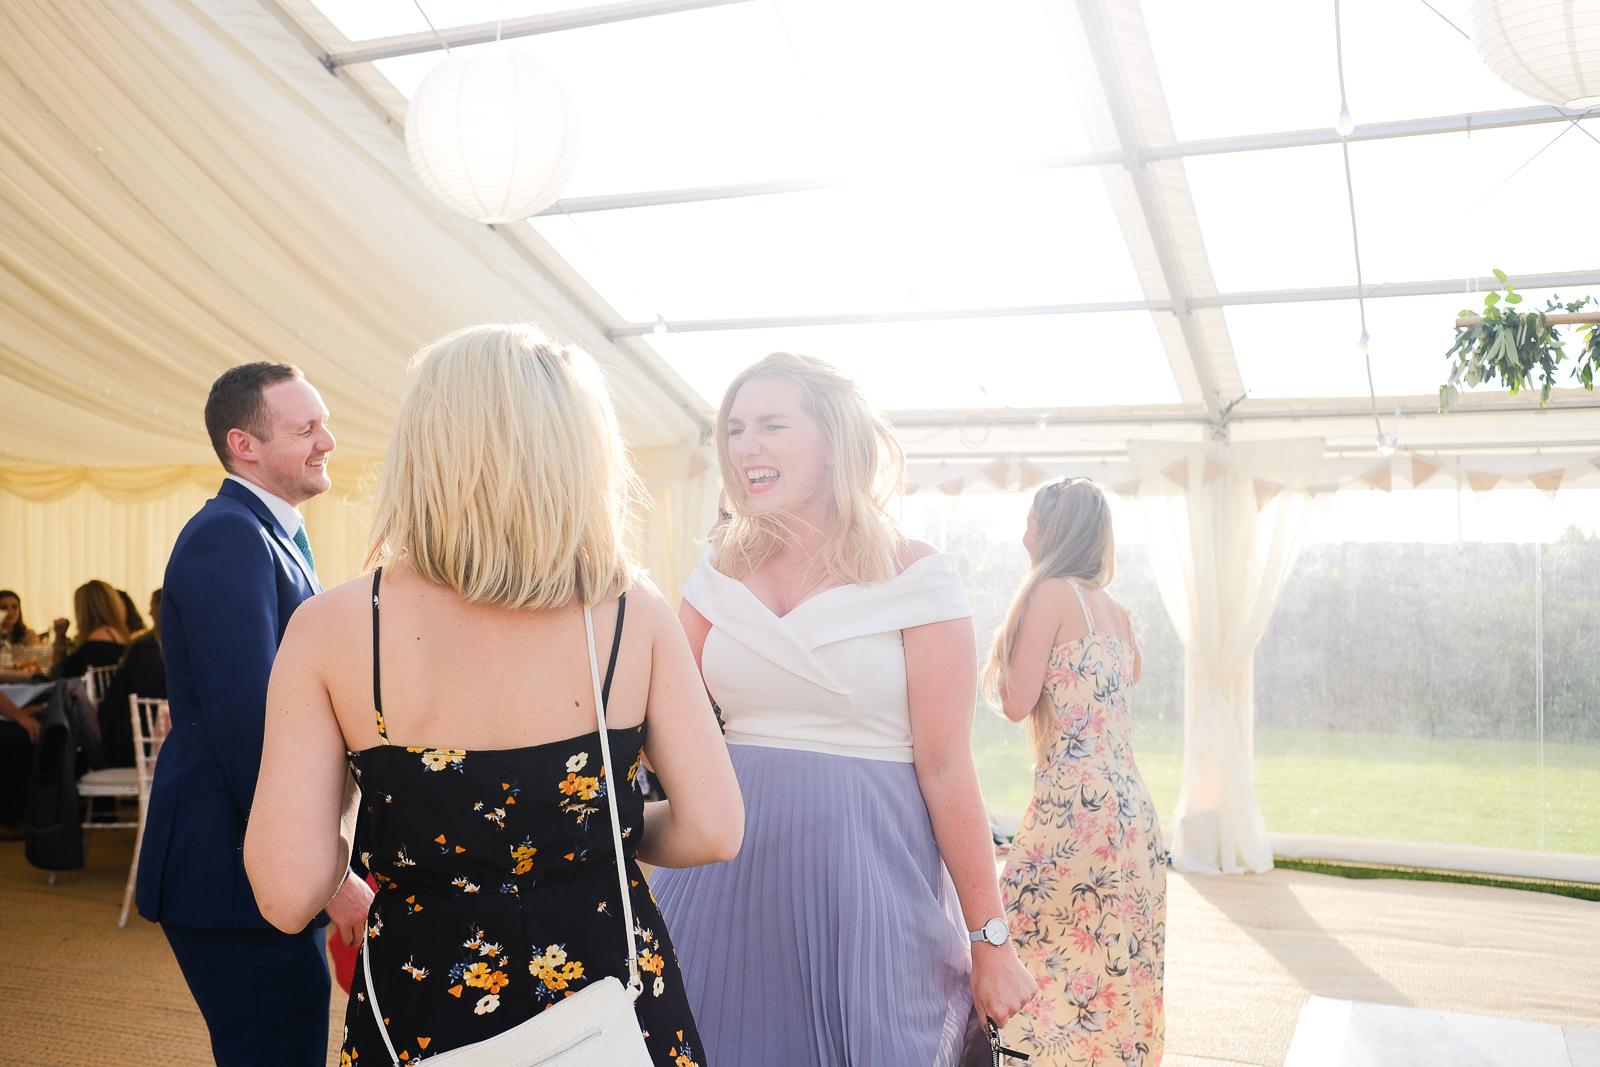 Roscarrock Farm wedding in Cornwall 071.jpg